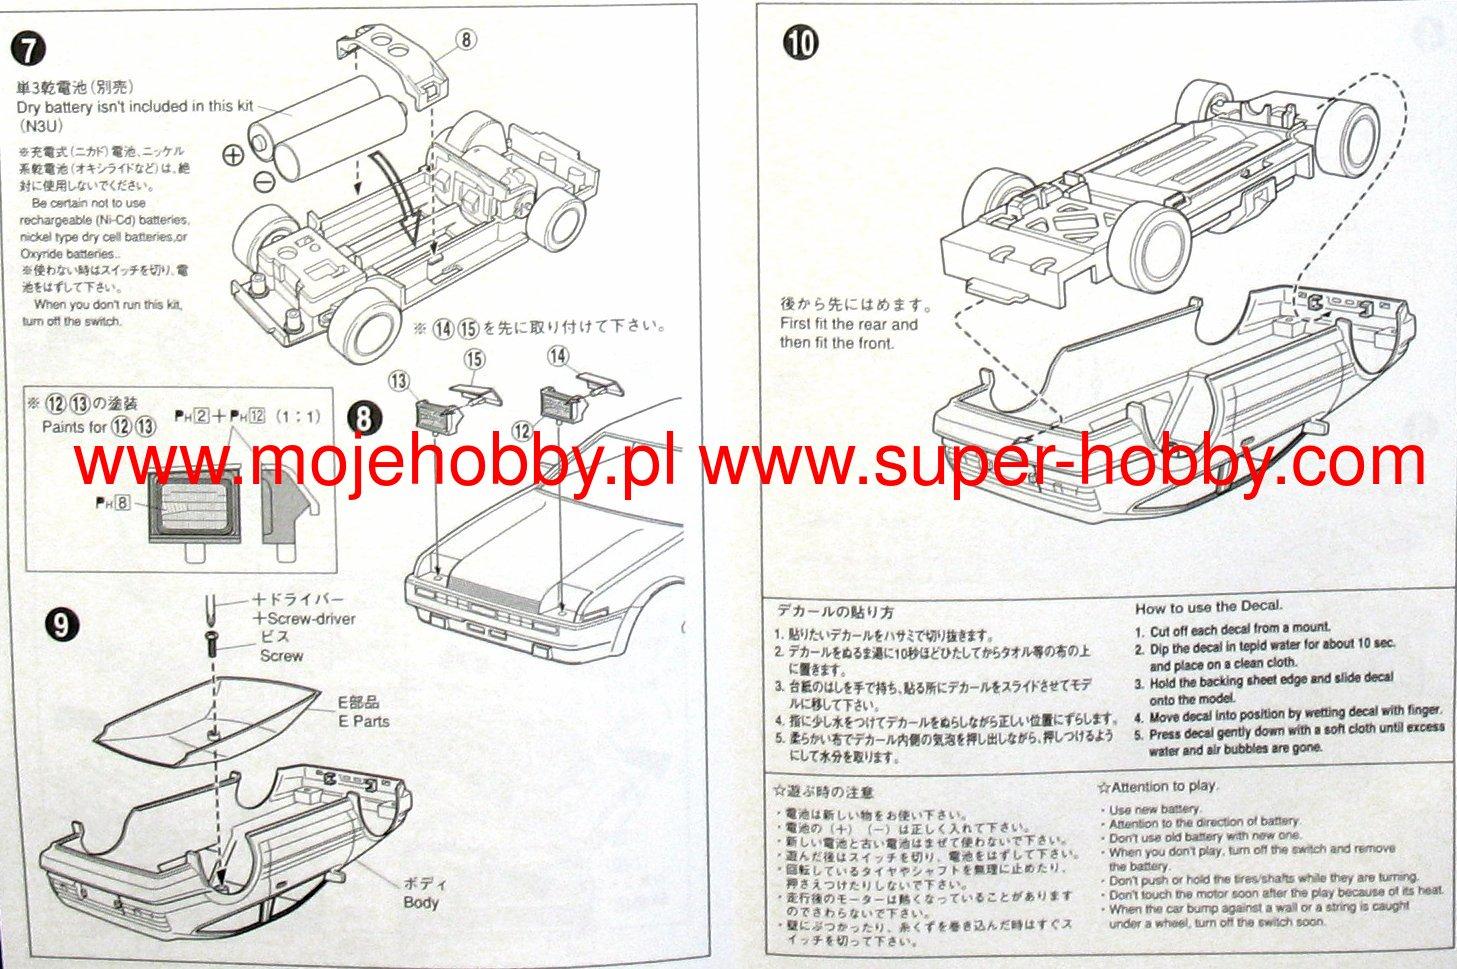 Initial D Toyota Takumi 86 Aoshima 00900 Drybatterycelldiagramjpg 2 Aos00900 4